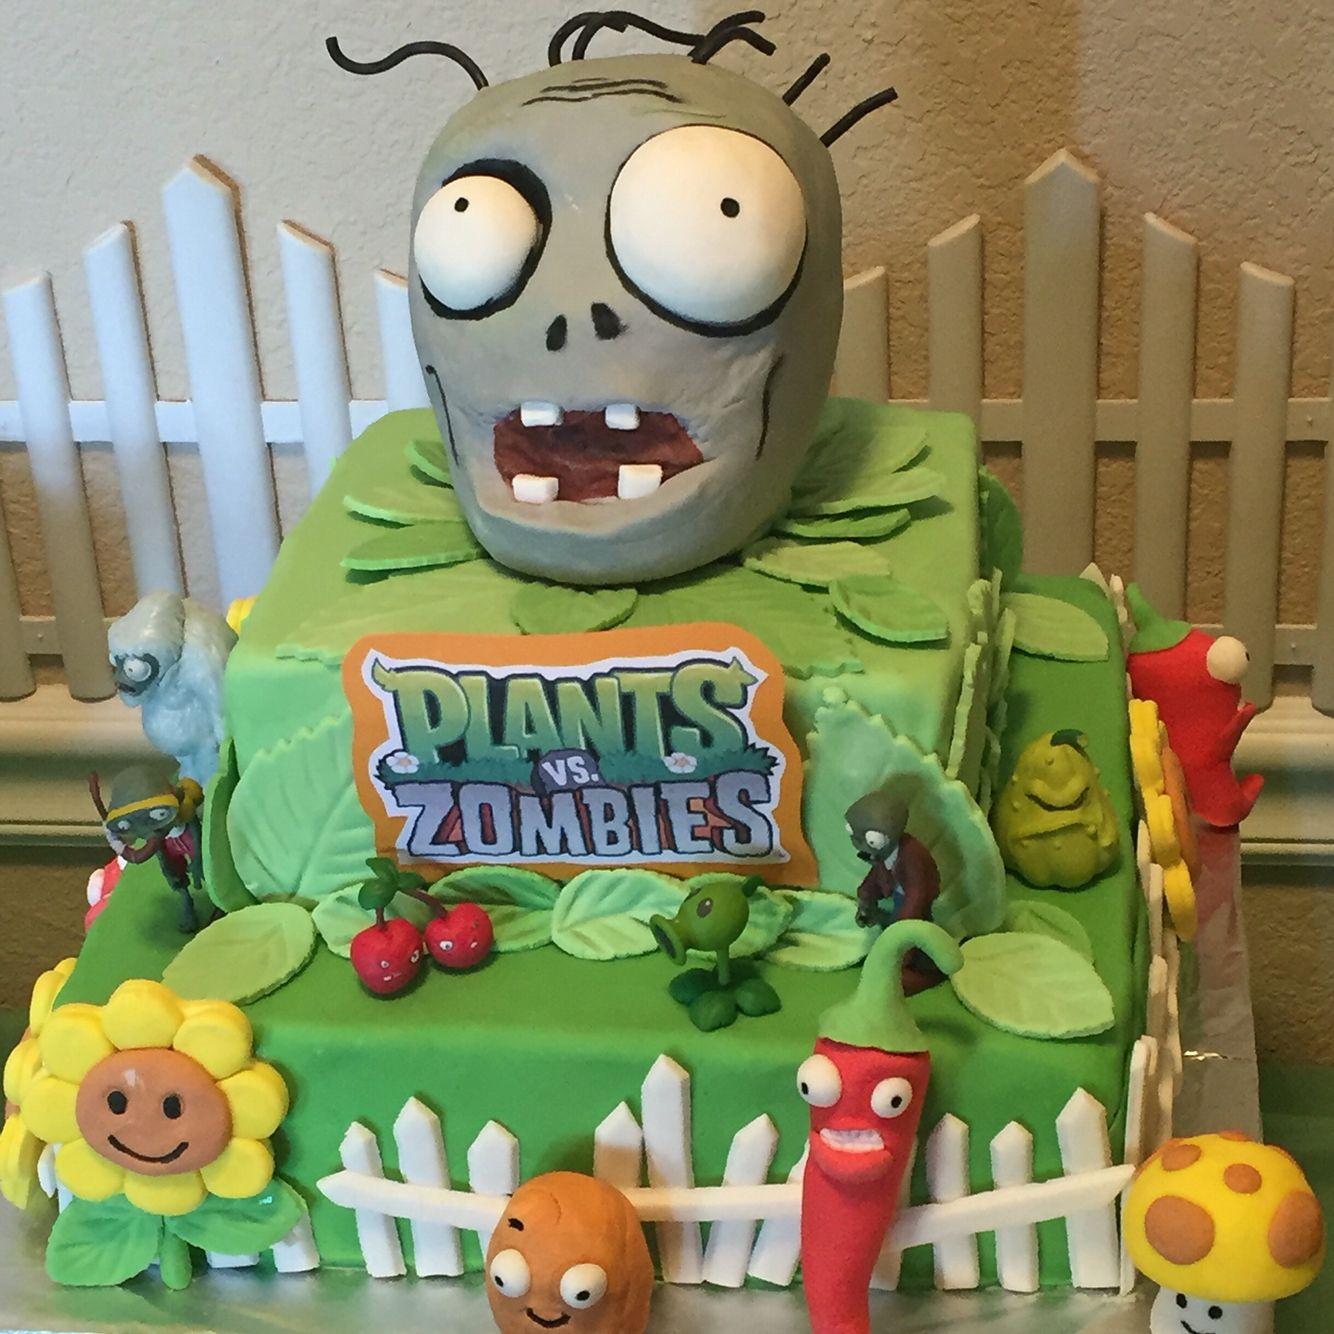 Plants vs Zombies cake Veros Creations Pinterest Plants vs